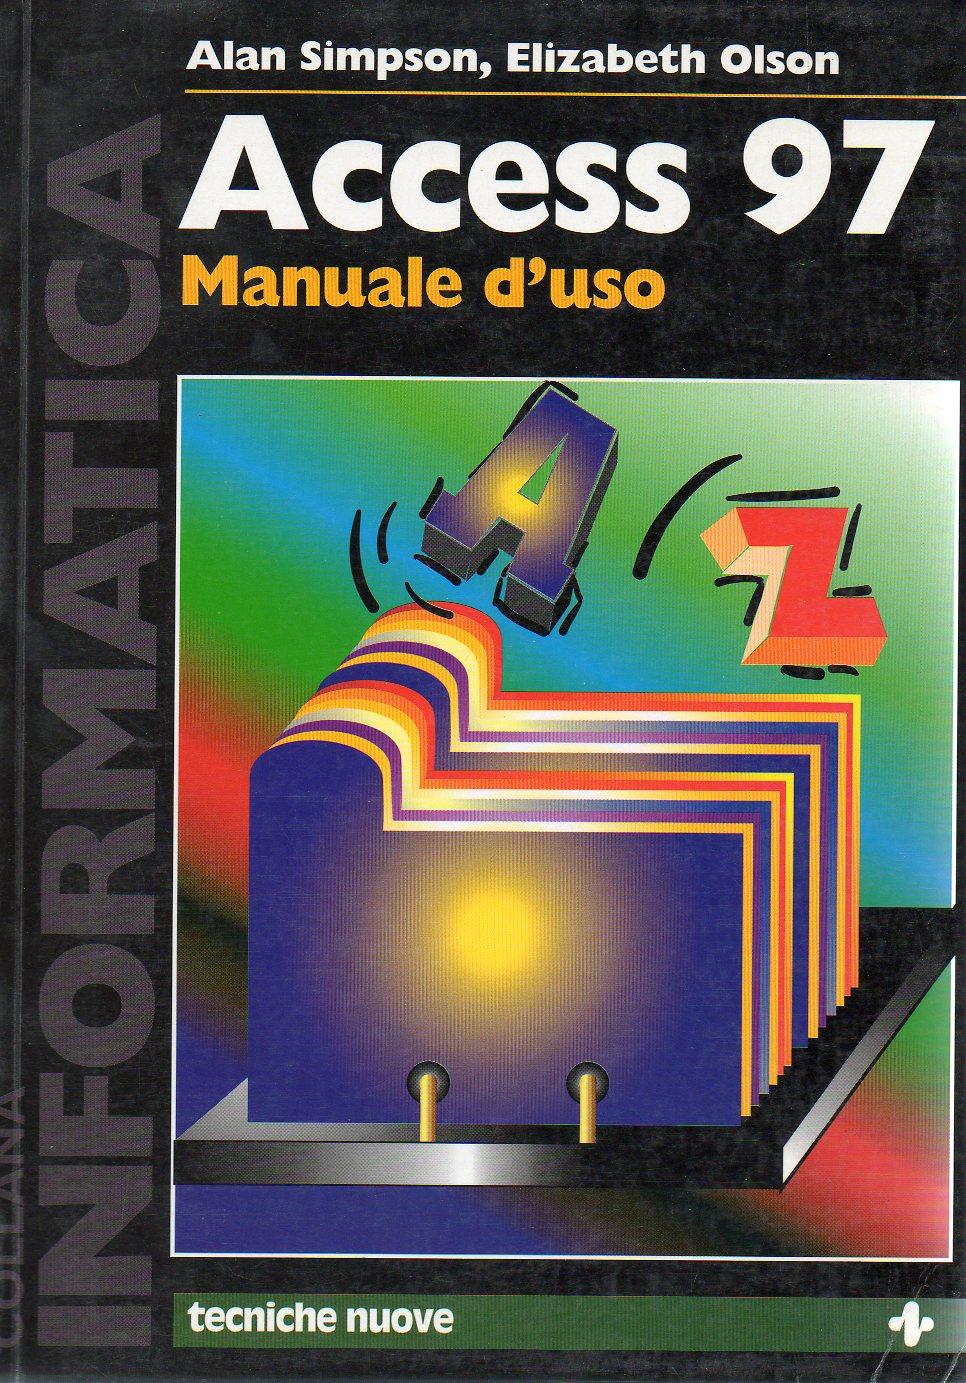 Access '97